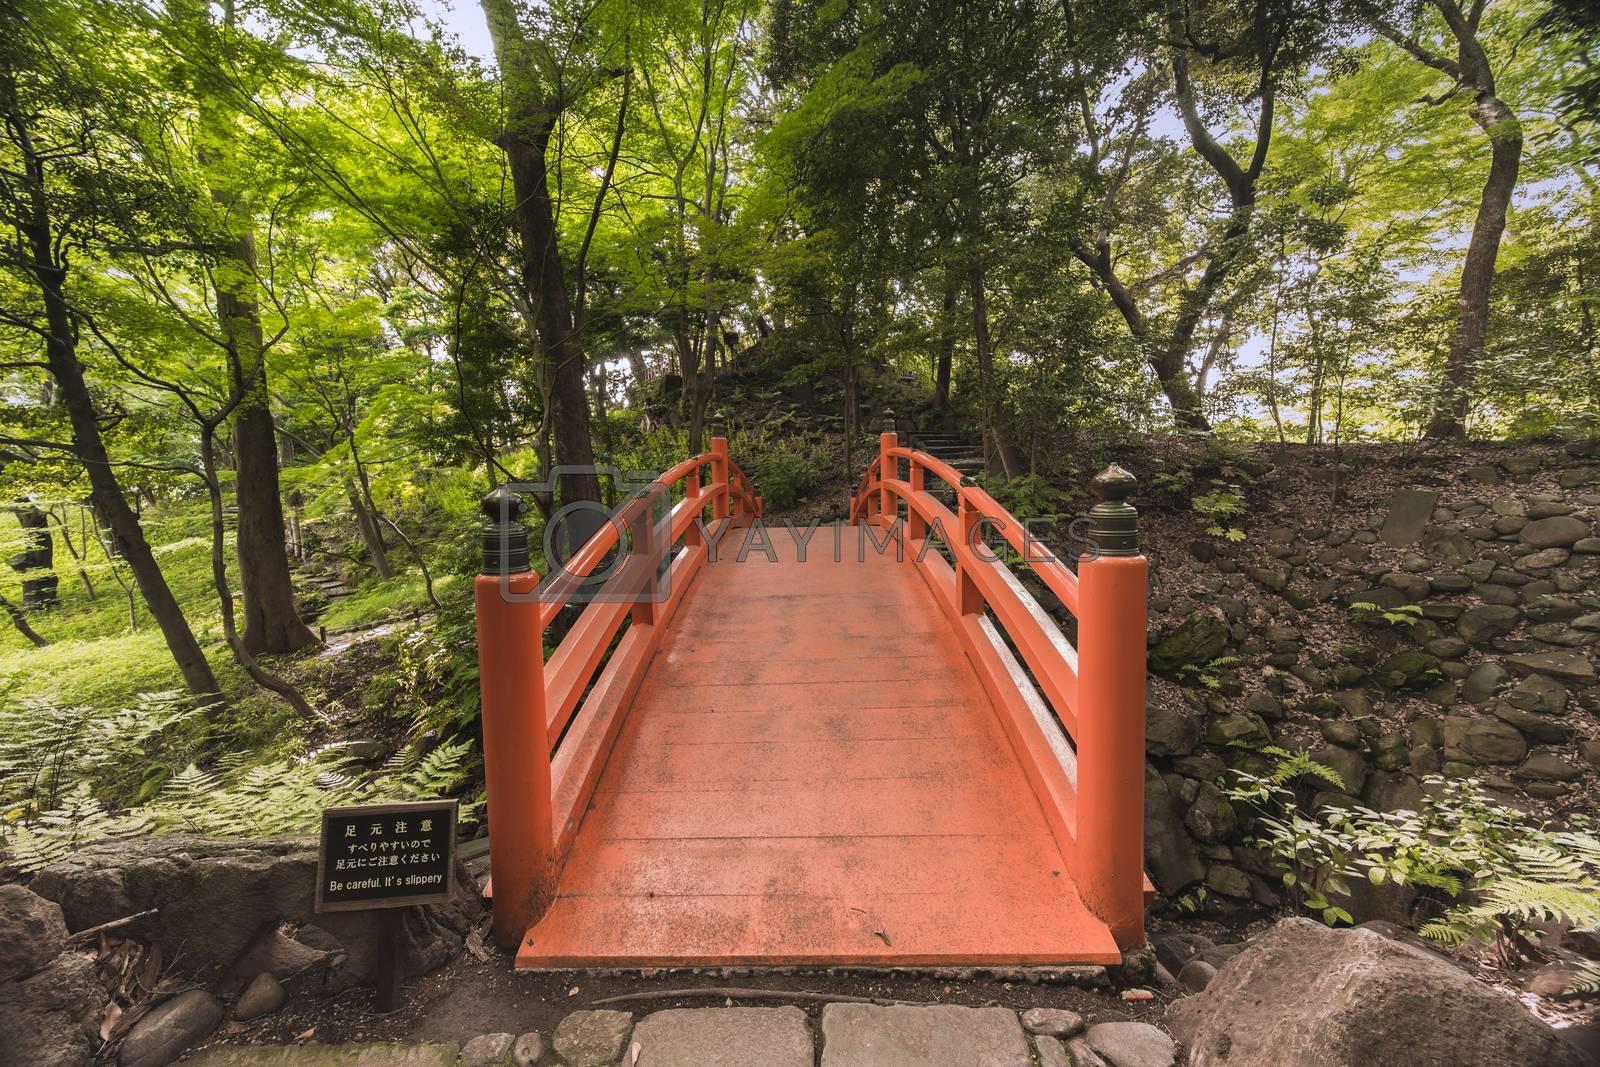 Japanese vermilion Tsuten bridge surrounded by maples and cherry trees in the forest of Koishikawa Korakuen Park.